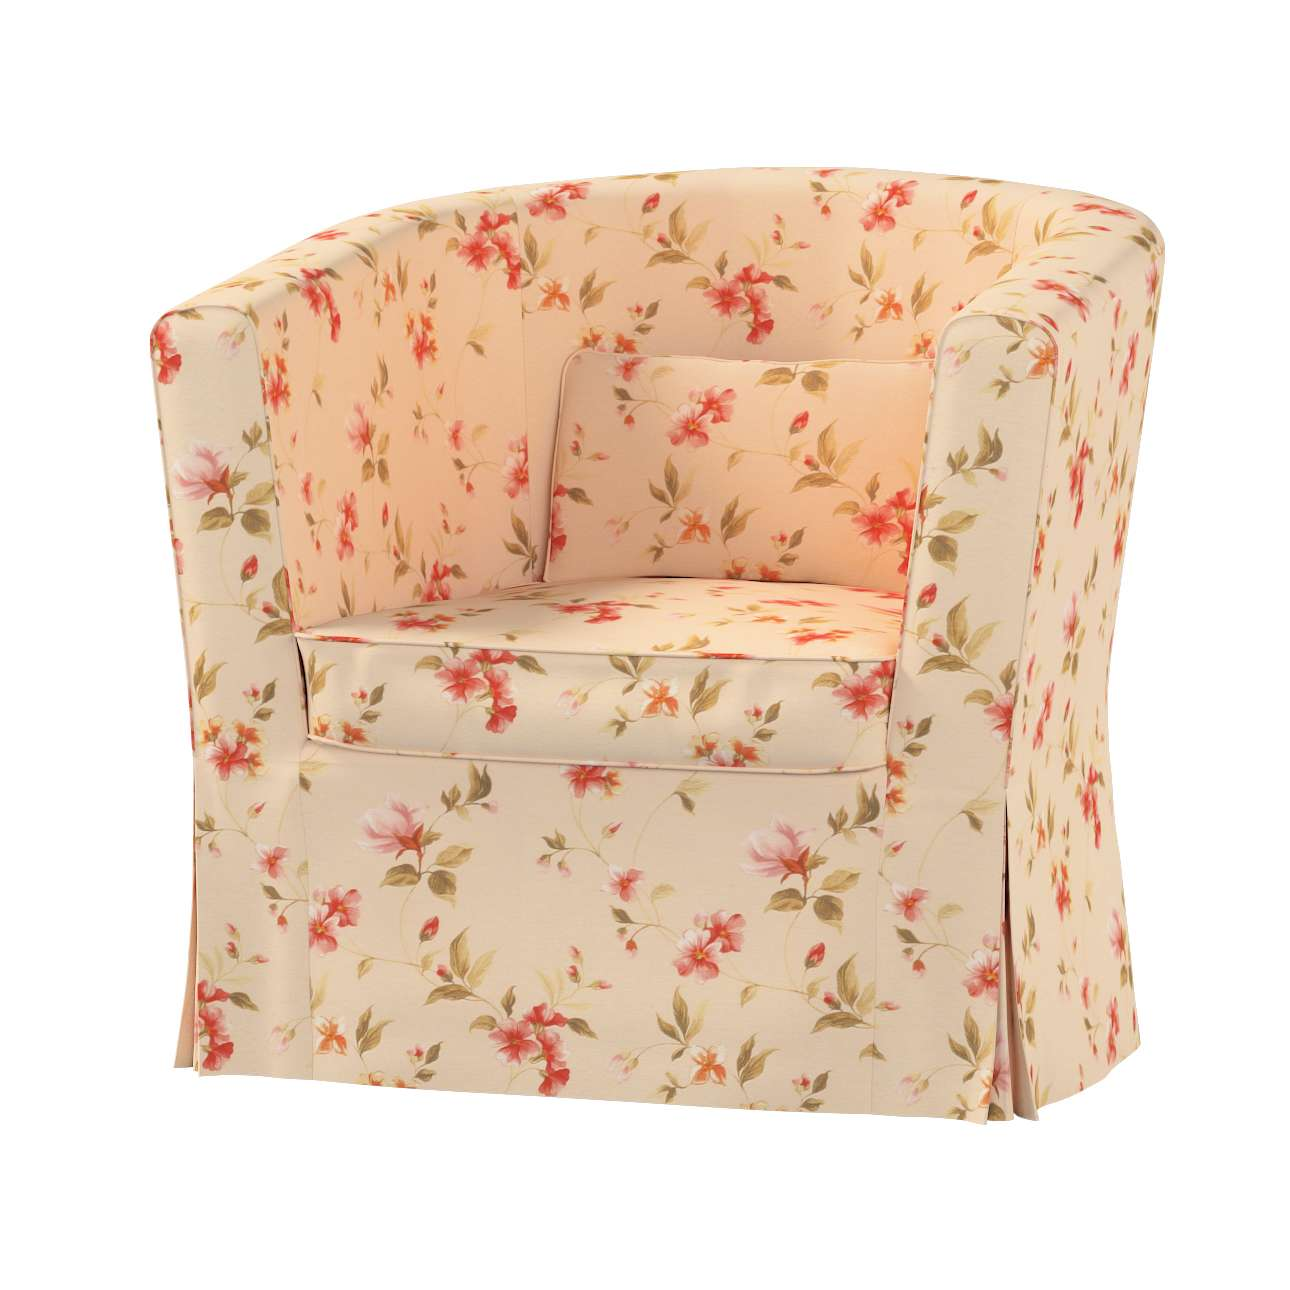 Ektorp Tullsta Sesselbezug Sesselhusse, Ektorp Tullsta von der Kollektion Londres, Stoff: 124-05